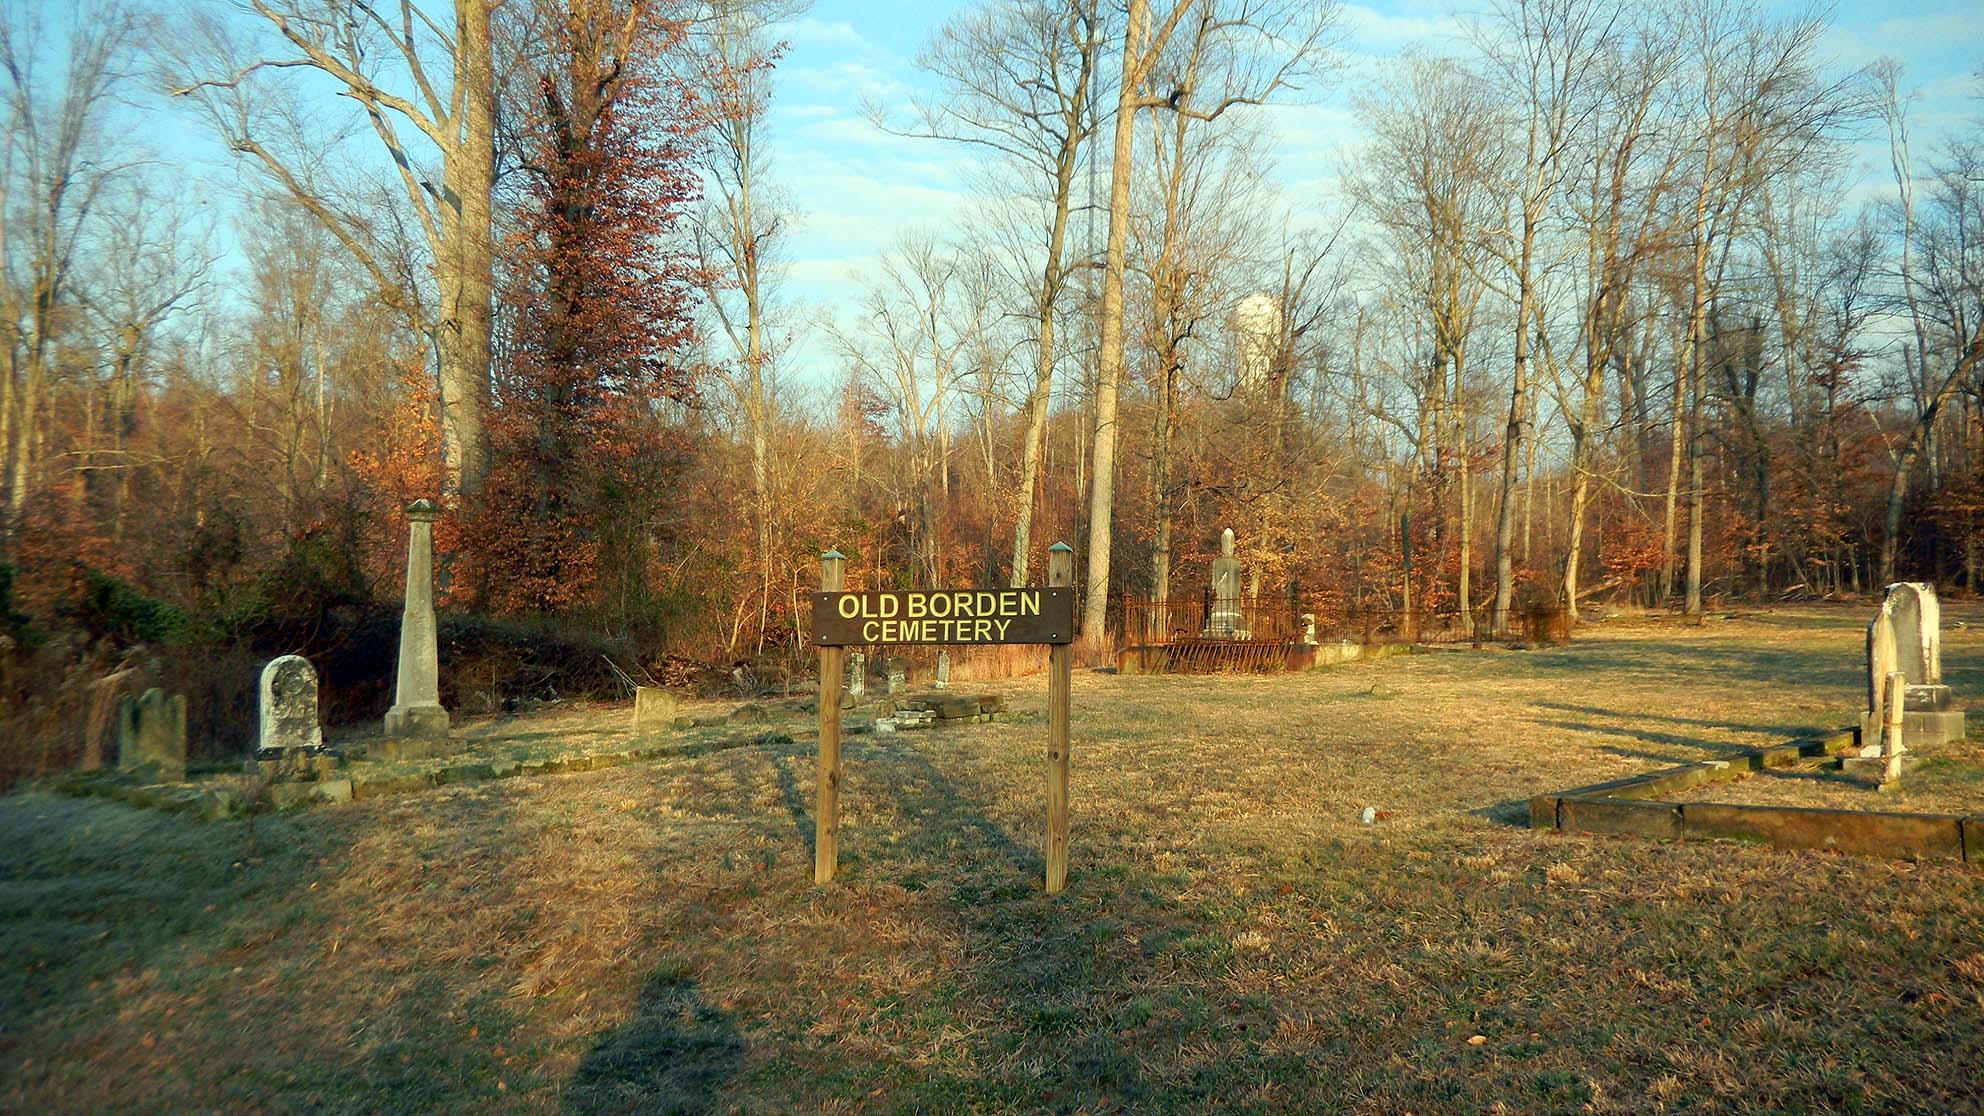 Old Borden Cemetery